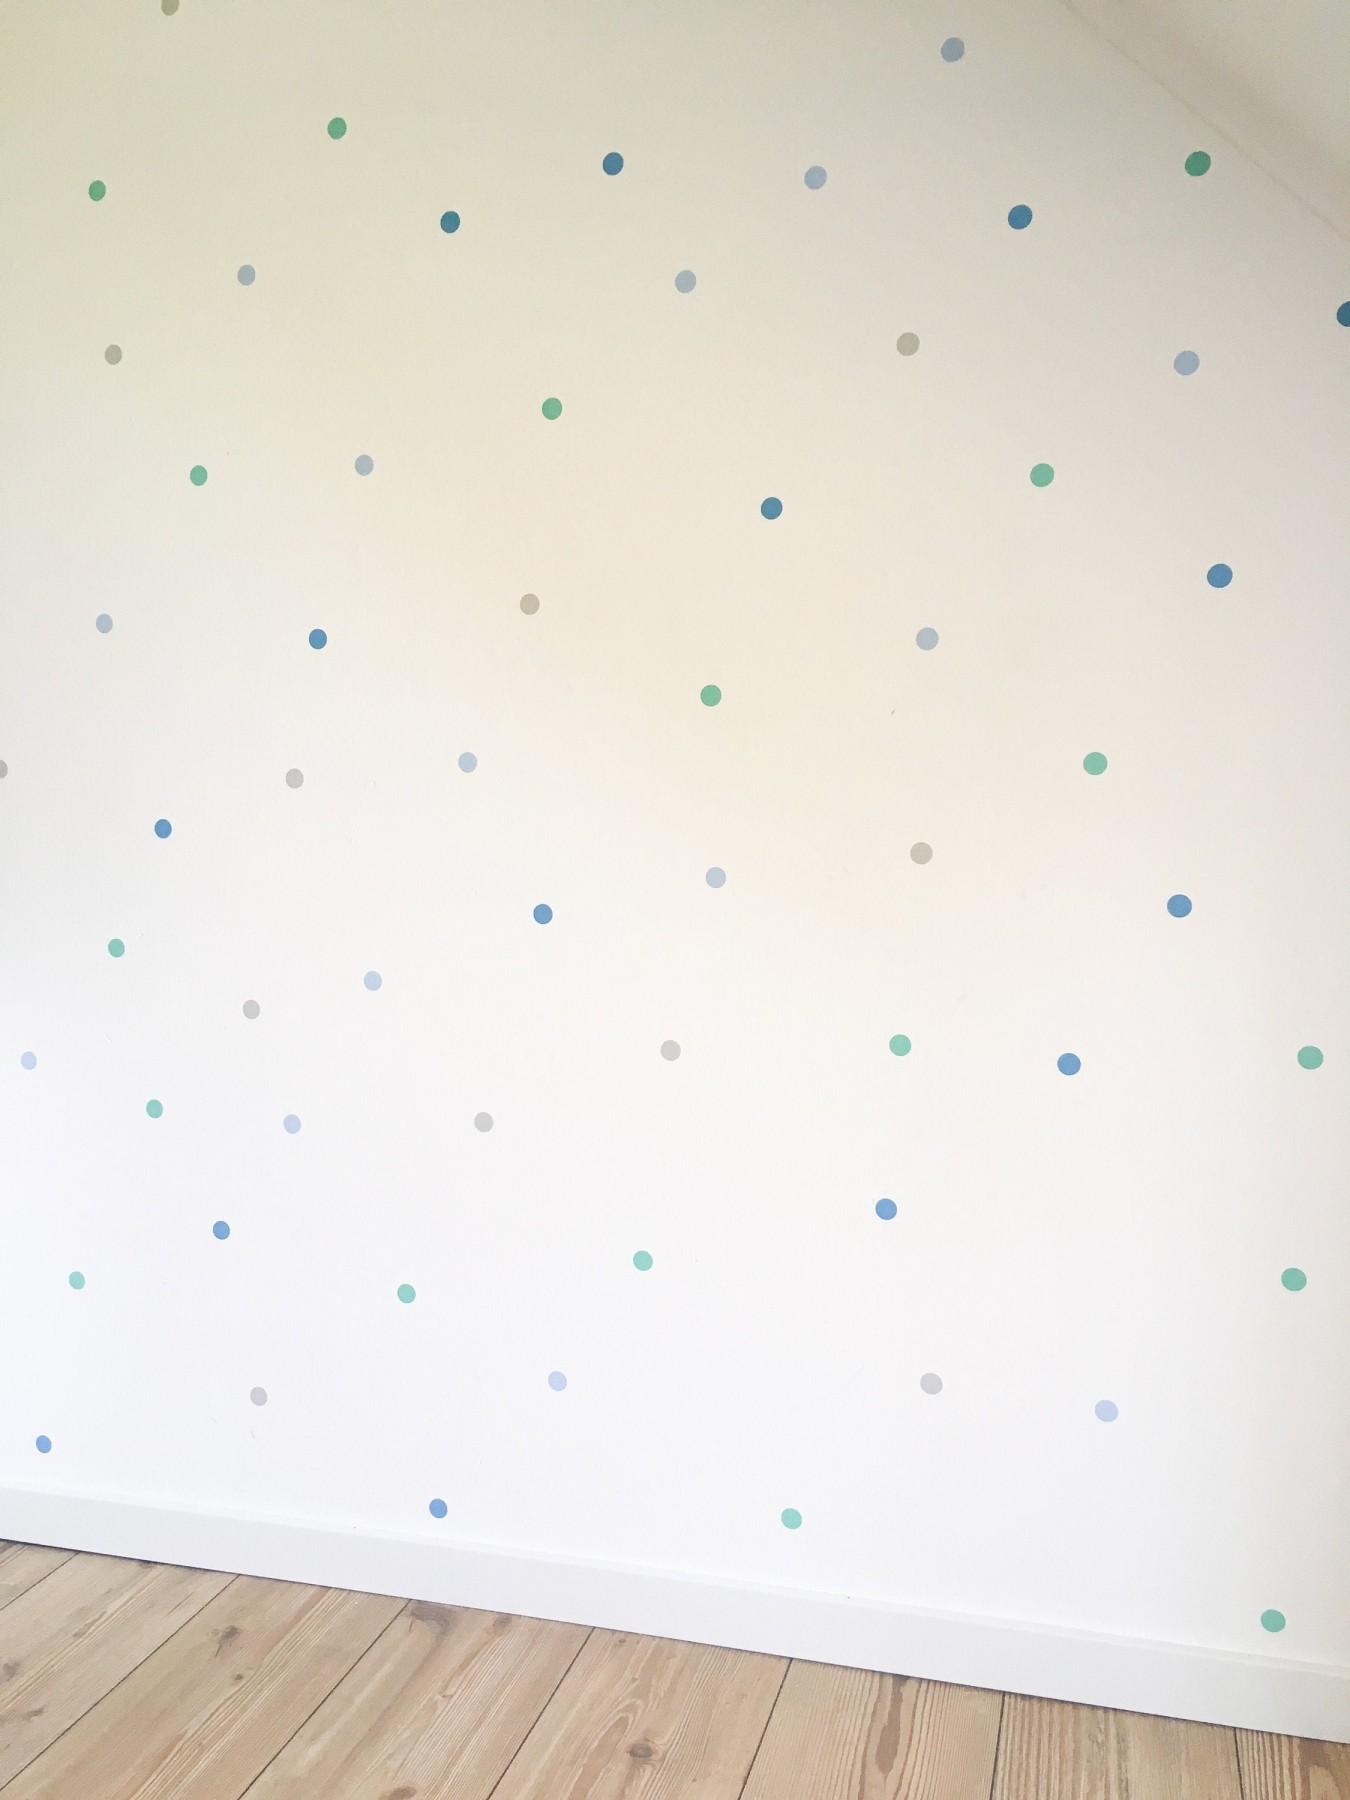 Full Size of Wandaufkleber Kinderzimmer Wanddekoration Wandtattoo Punkte Regale Sofa Regal Weiß Kinderzimmer Wandaufkleber Kinderzimmer